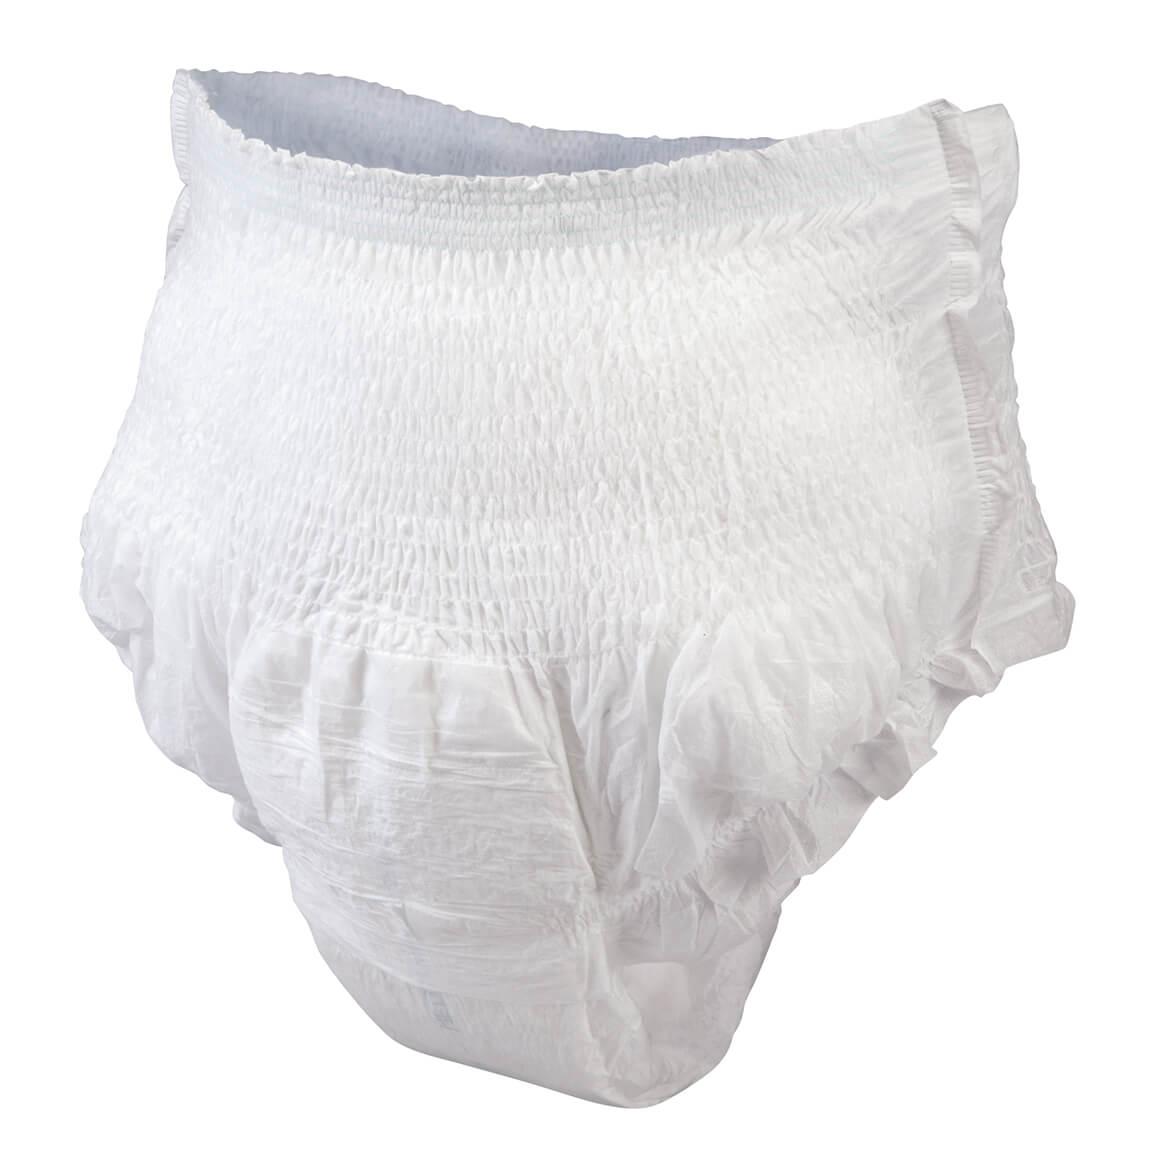 Unisex Protective Underwear, Package-347594